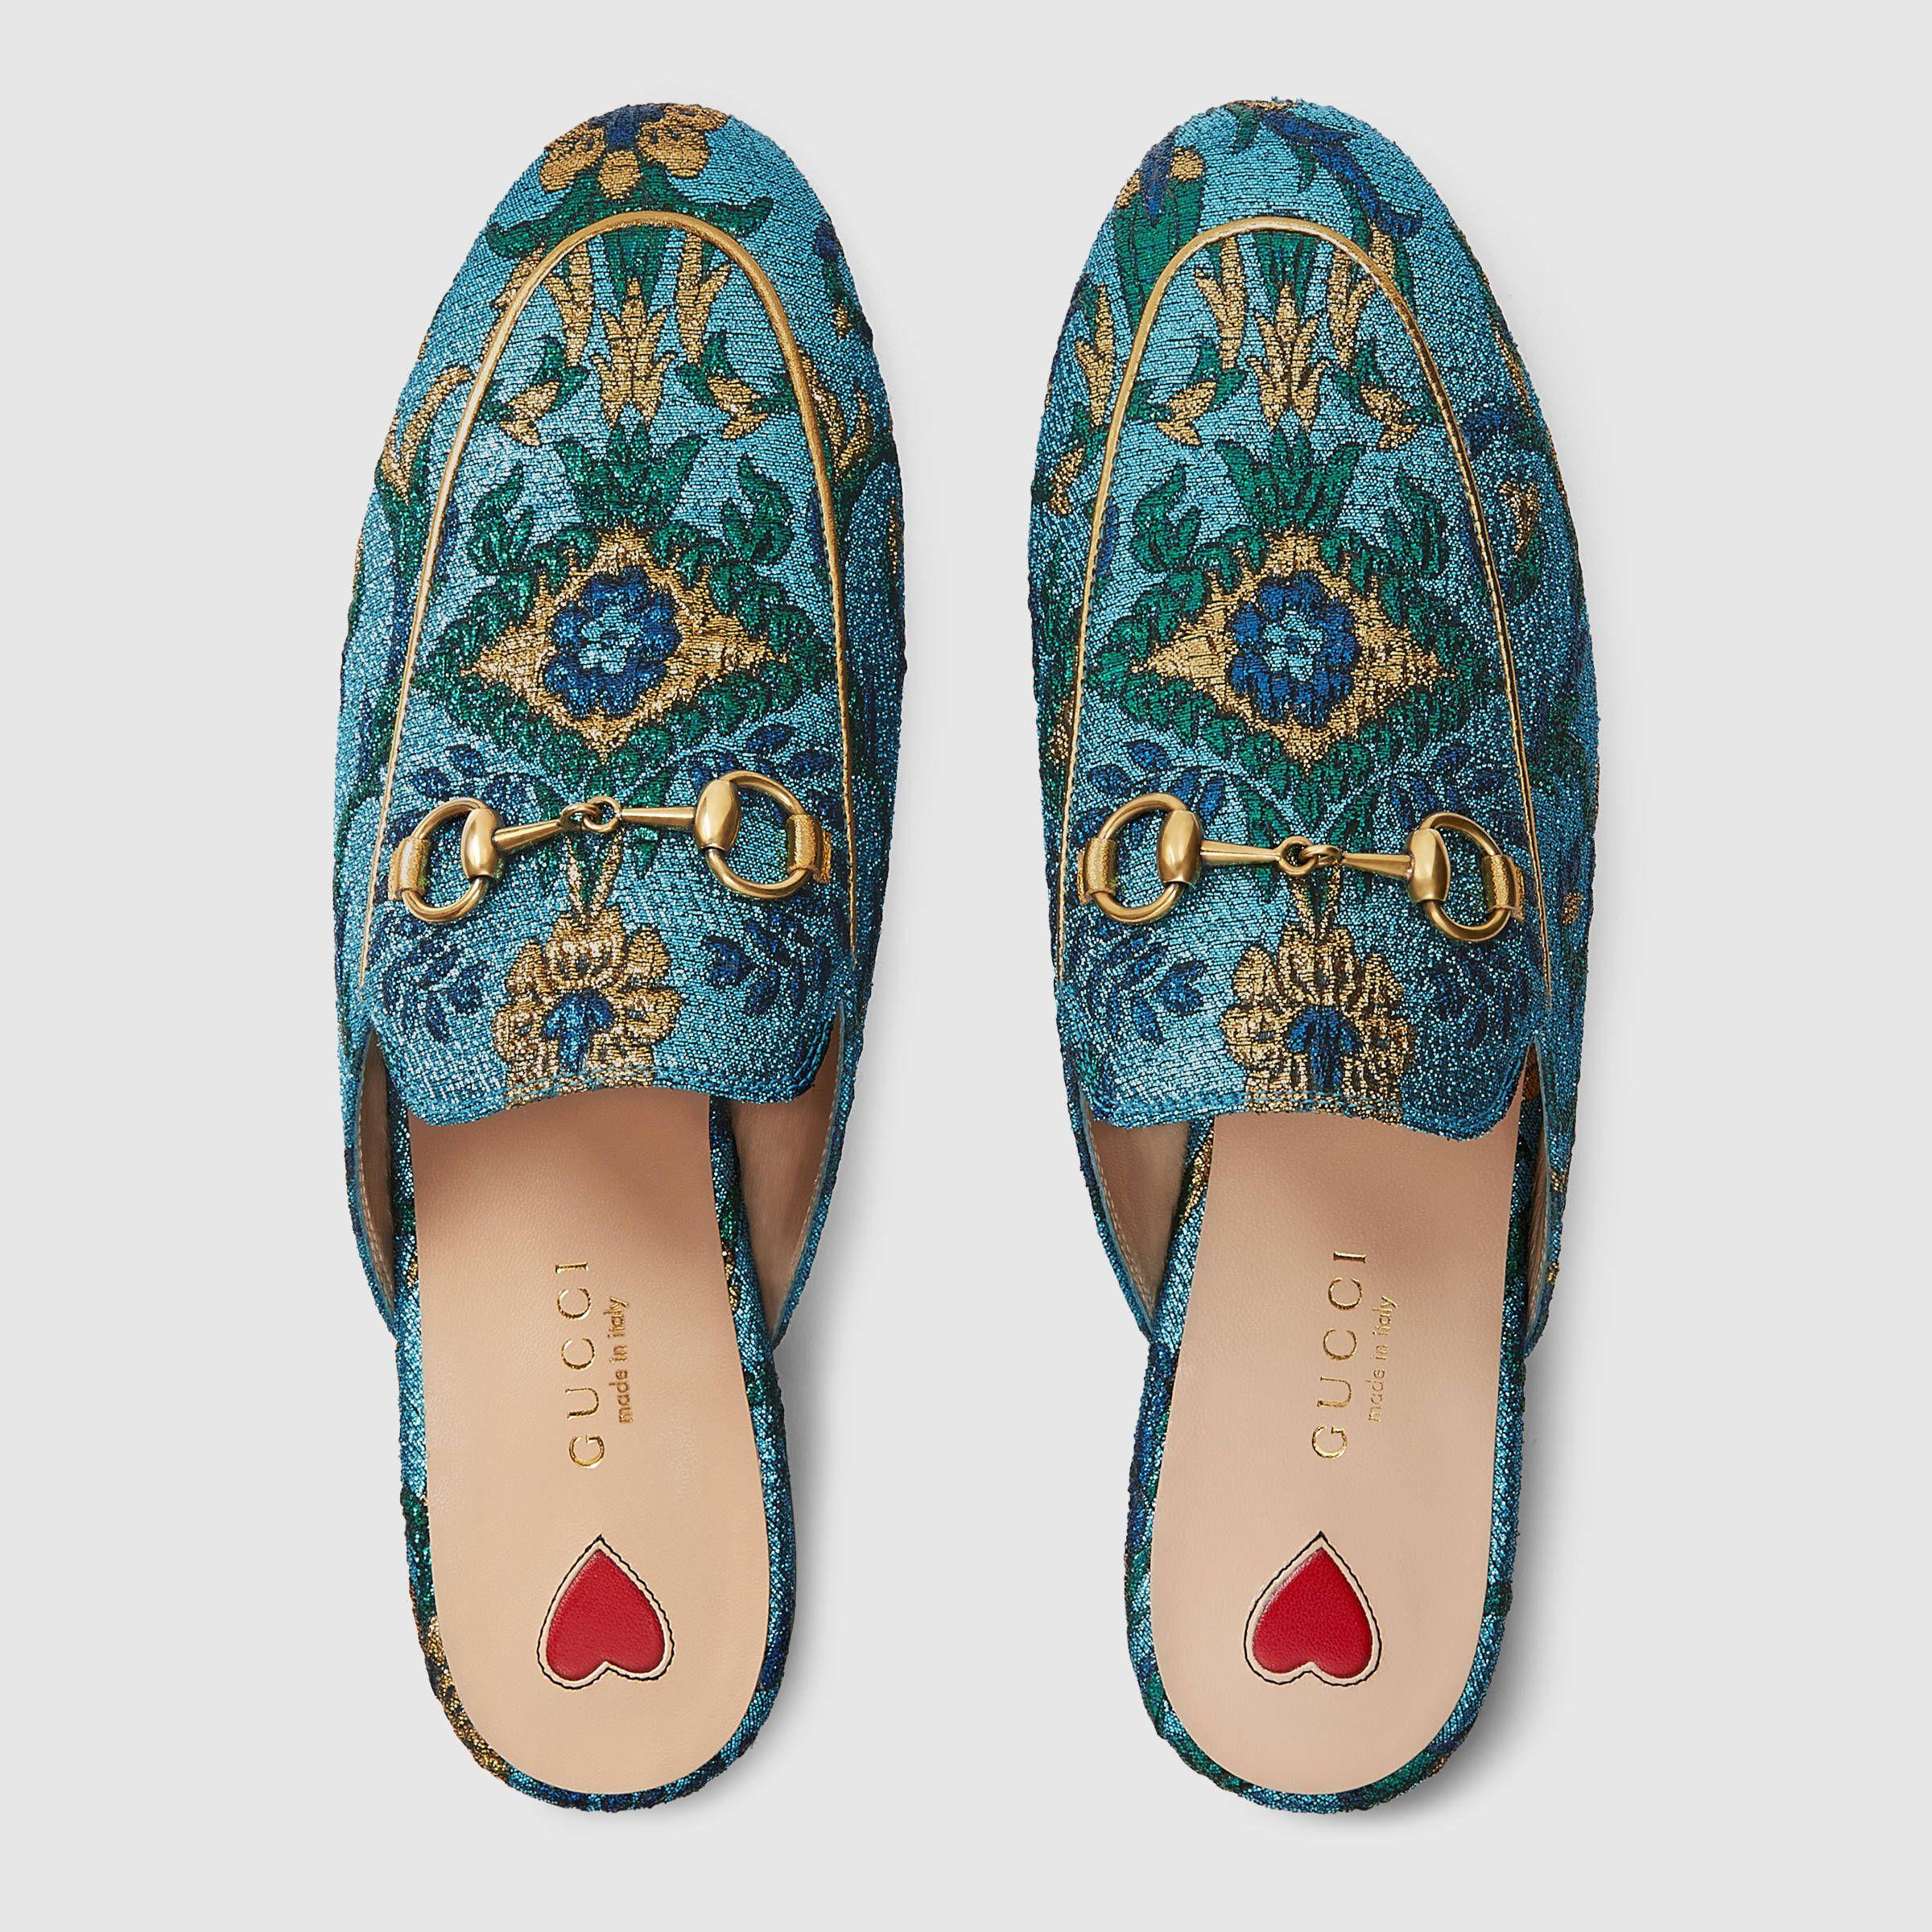 cc429a01e6b Princetown brocade slipper - Gucci Women s Moccasins   Loafers  472640K9O204967